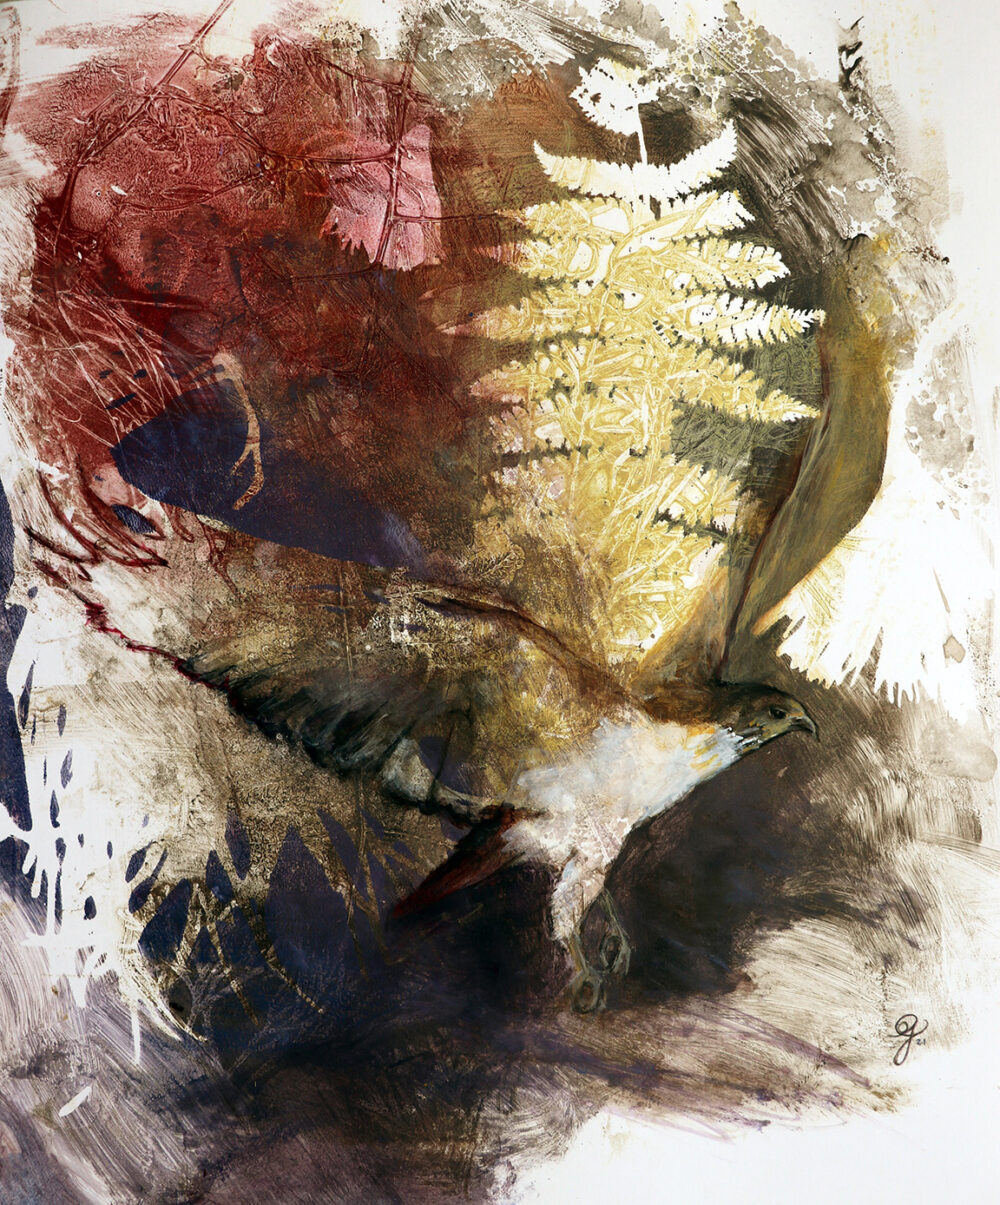 peinture-oiseau-de-proie-impression-botanique-artiste-peintre-carine-genadry